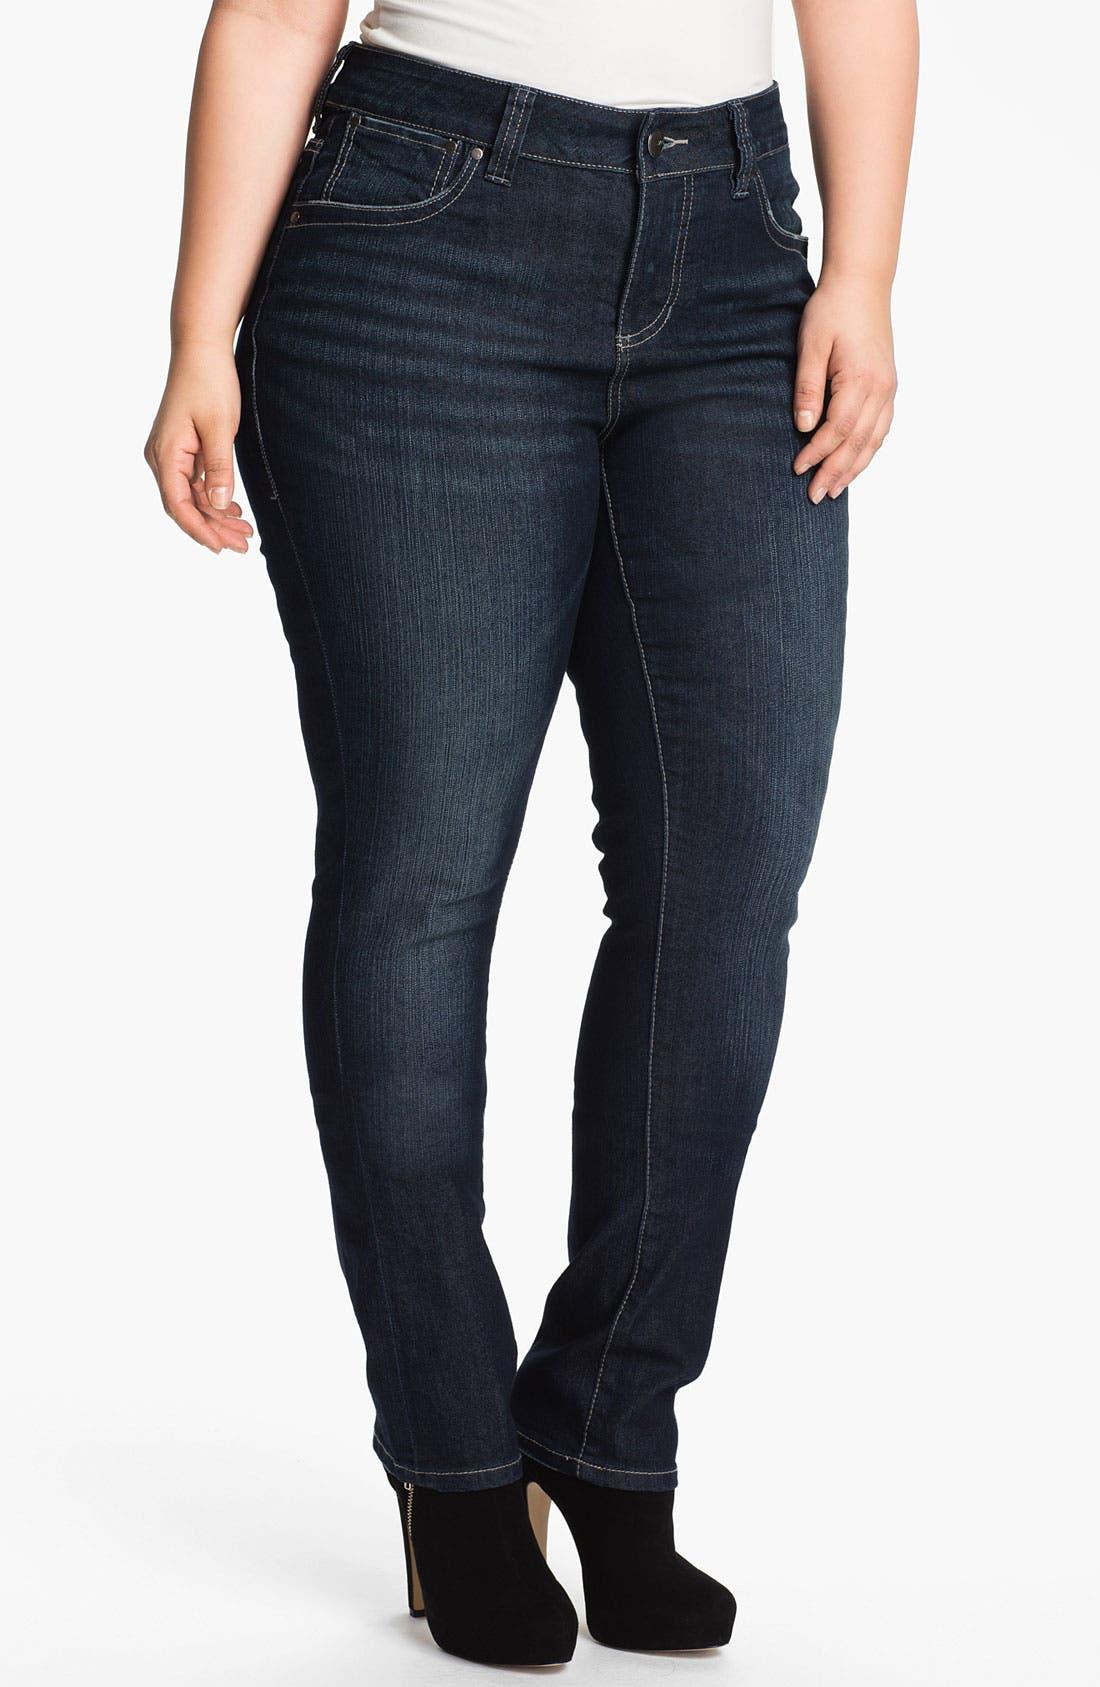 Alternate Image 1 Selected - Jag Jeans 'Bevin' Slim Stretch Jeans (Plus Size)